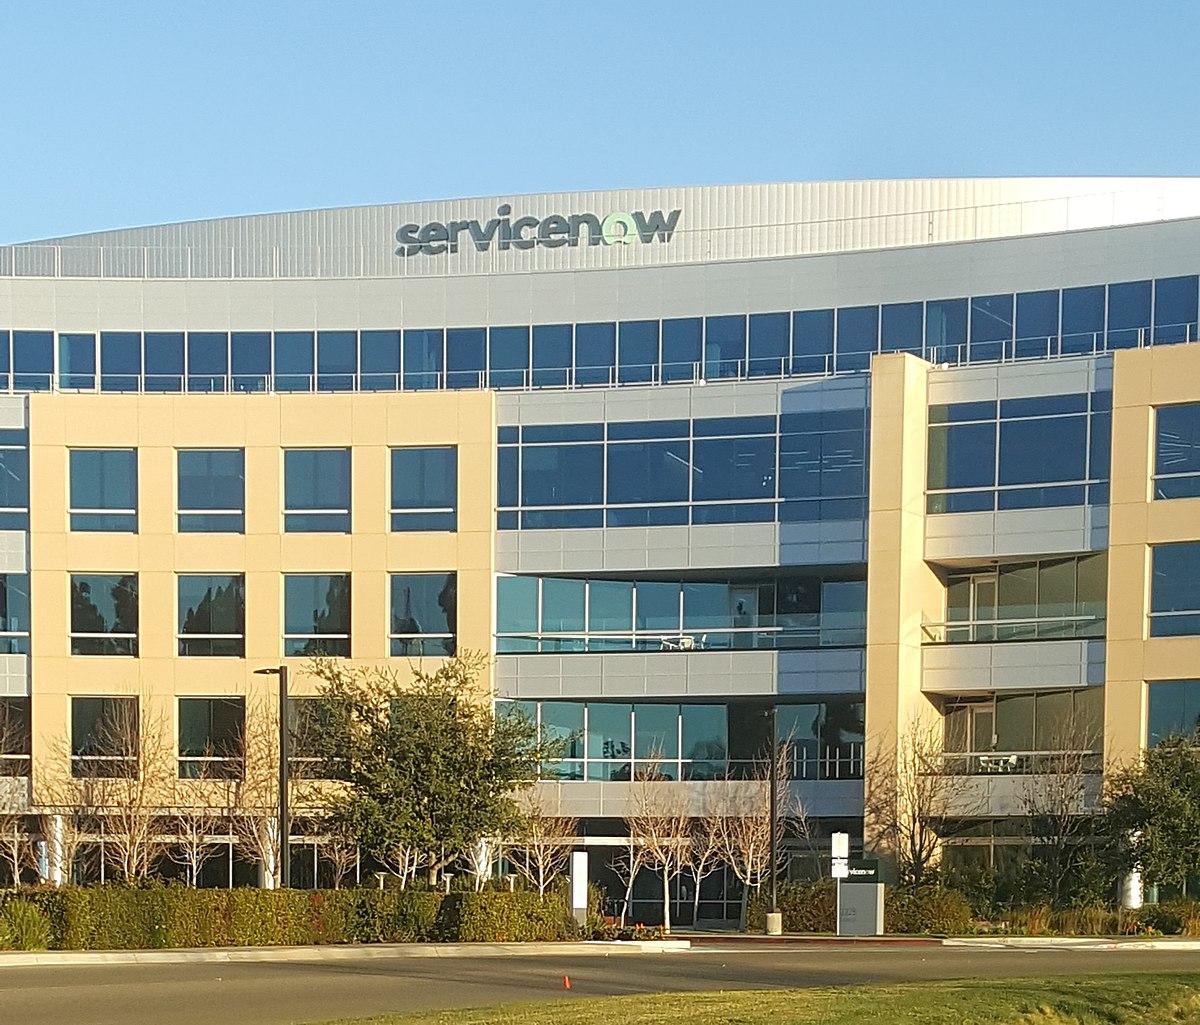 ServiceNow - Wikipedia